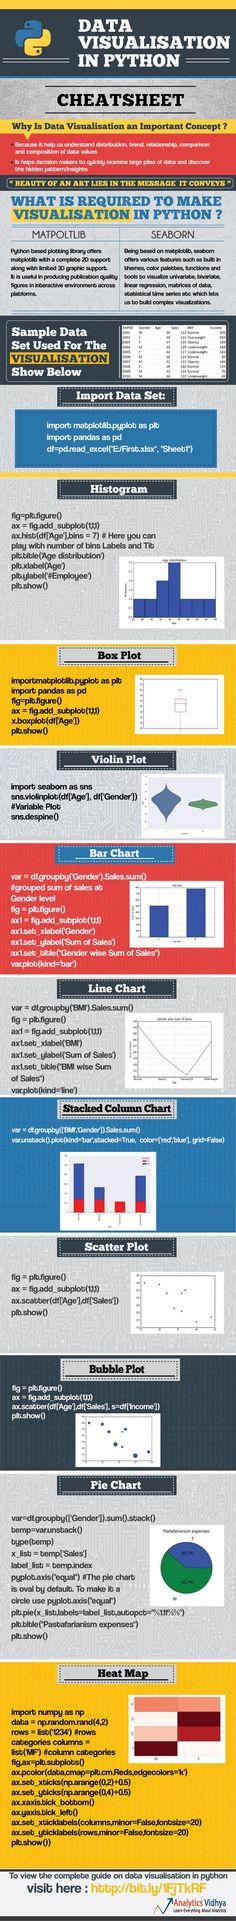 Cheat Sheet on Data visualisation in Python: Cheat Sheet